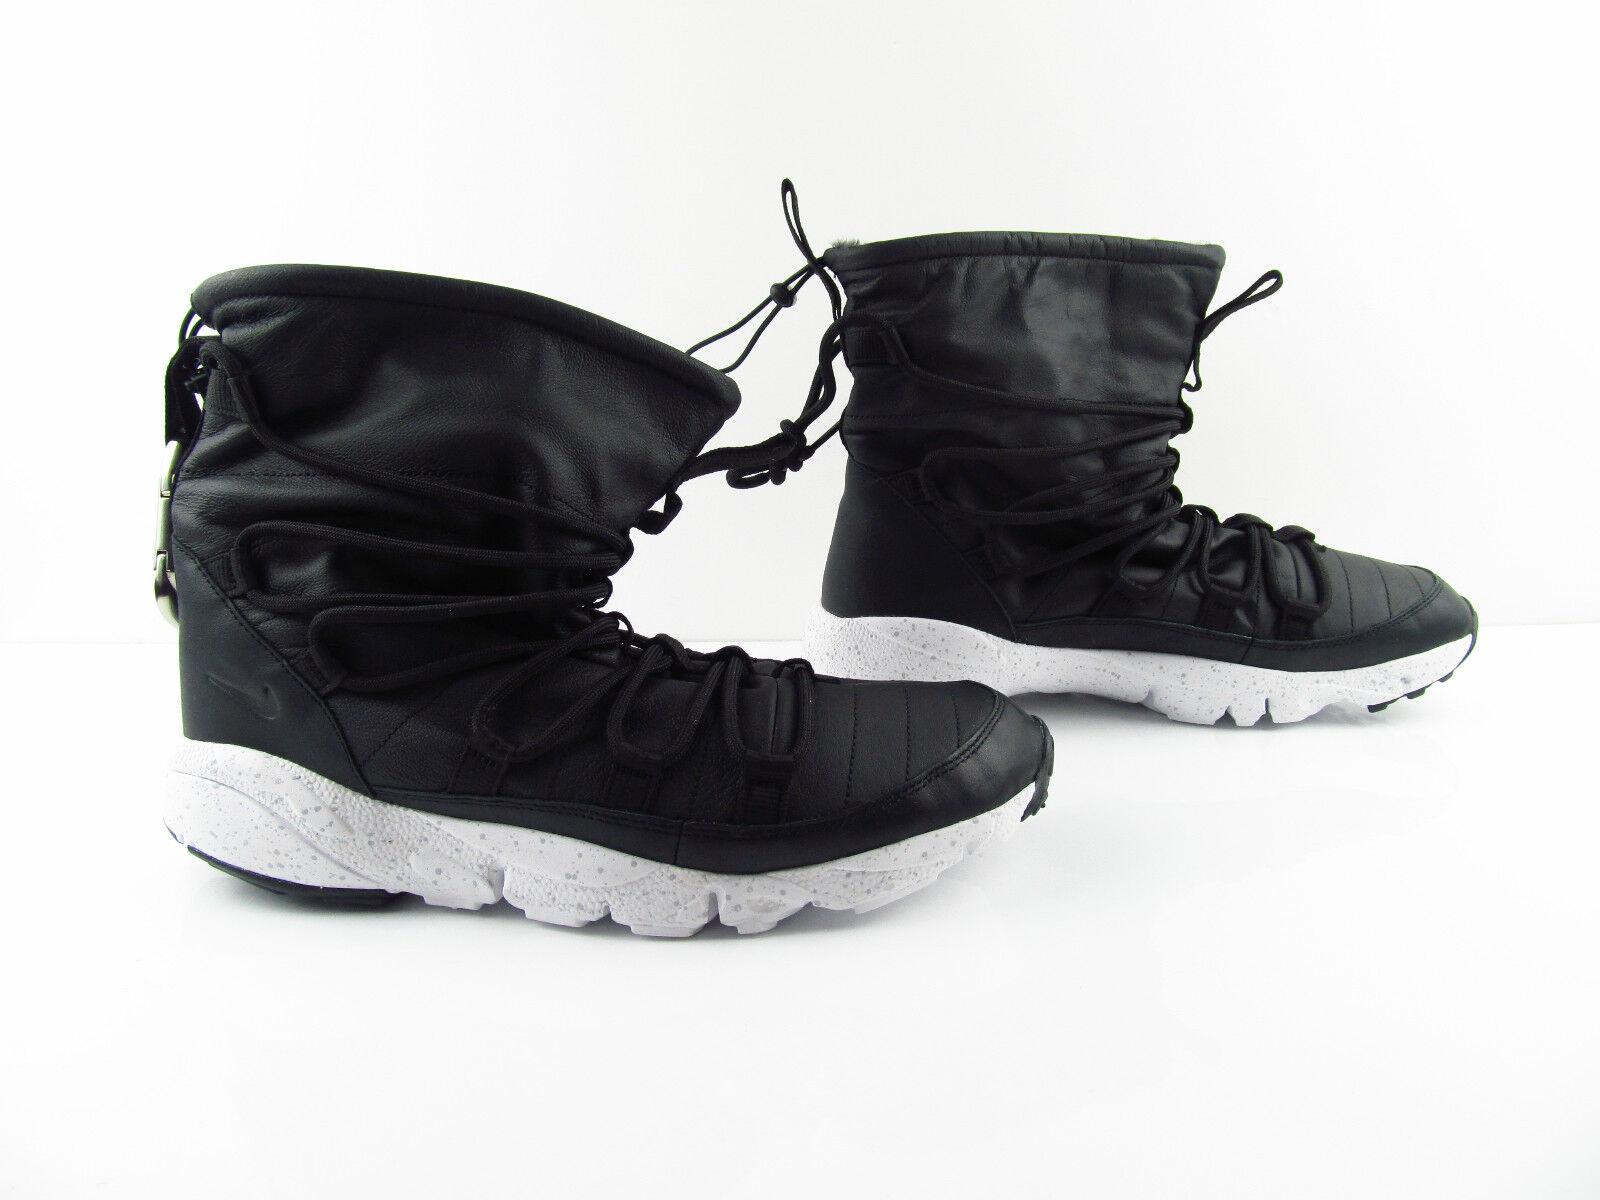 Nike Footscape Route SP Sneakerboot schwarz Anthracite NEU Nikelab 728746-001